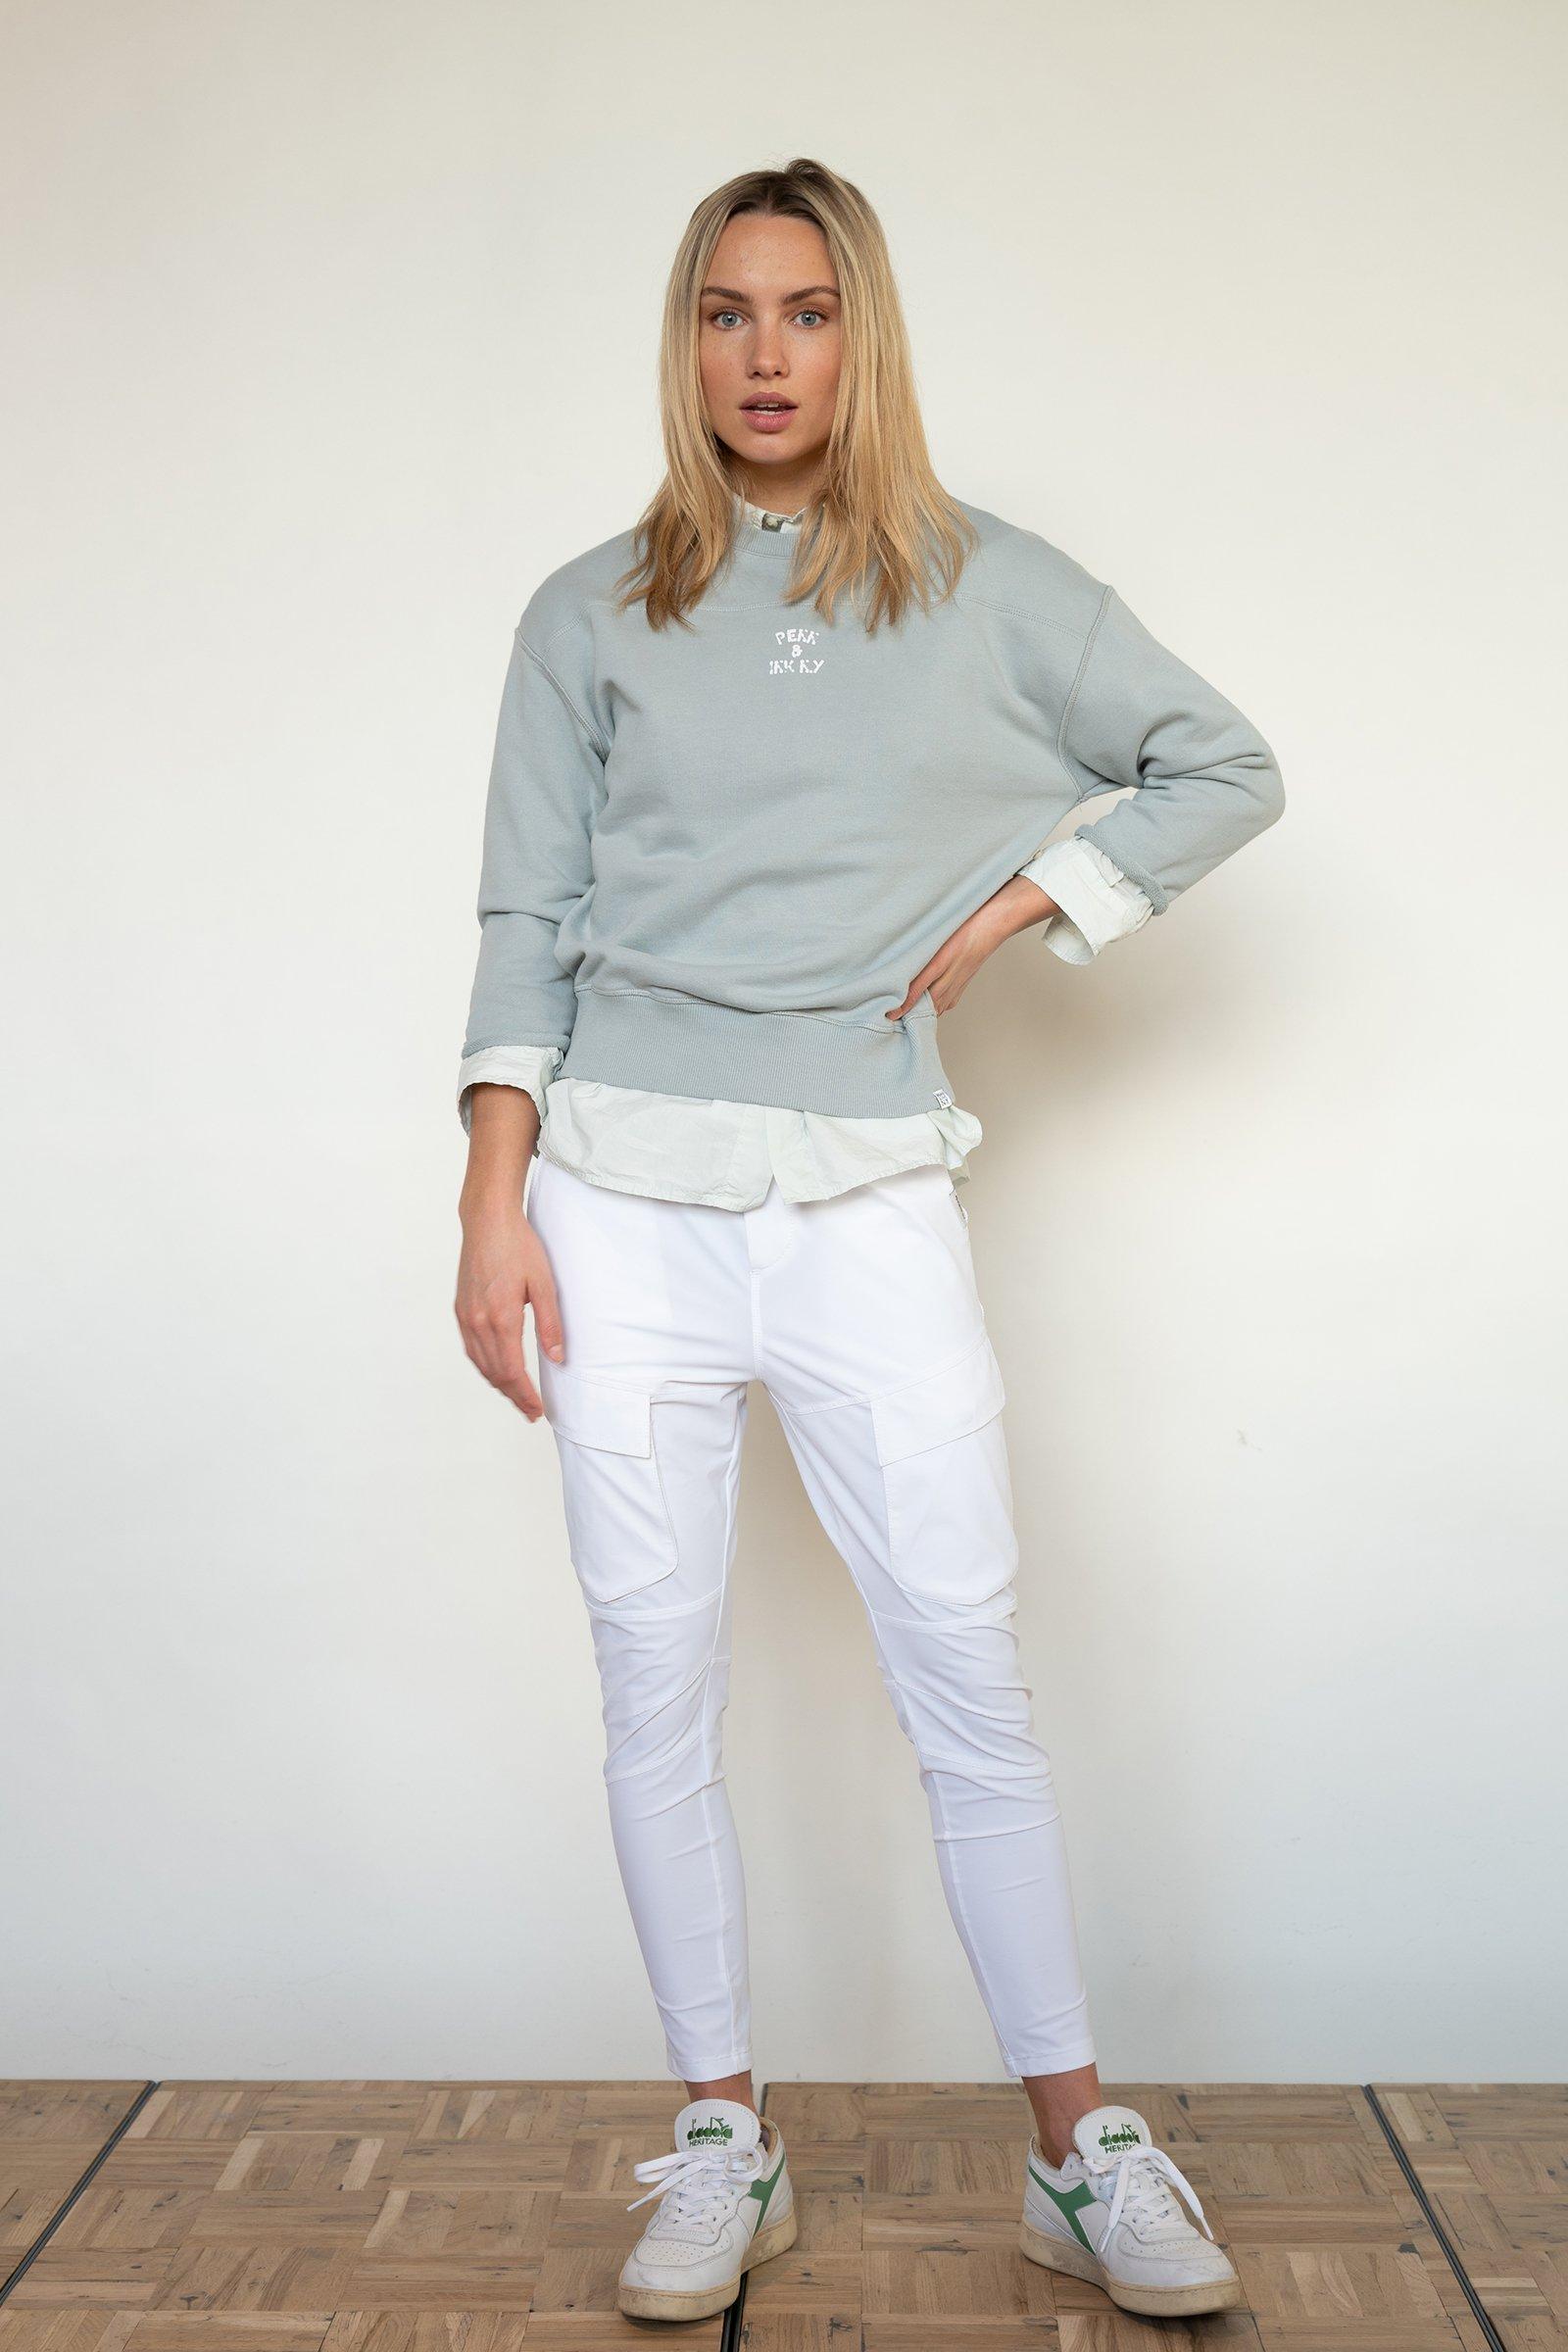 PENN-&-INK-Sweater-Print-Pigeon/White-S21T563-542